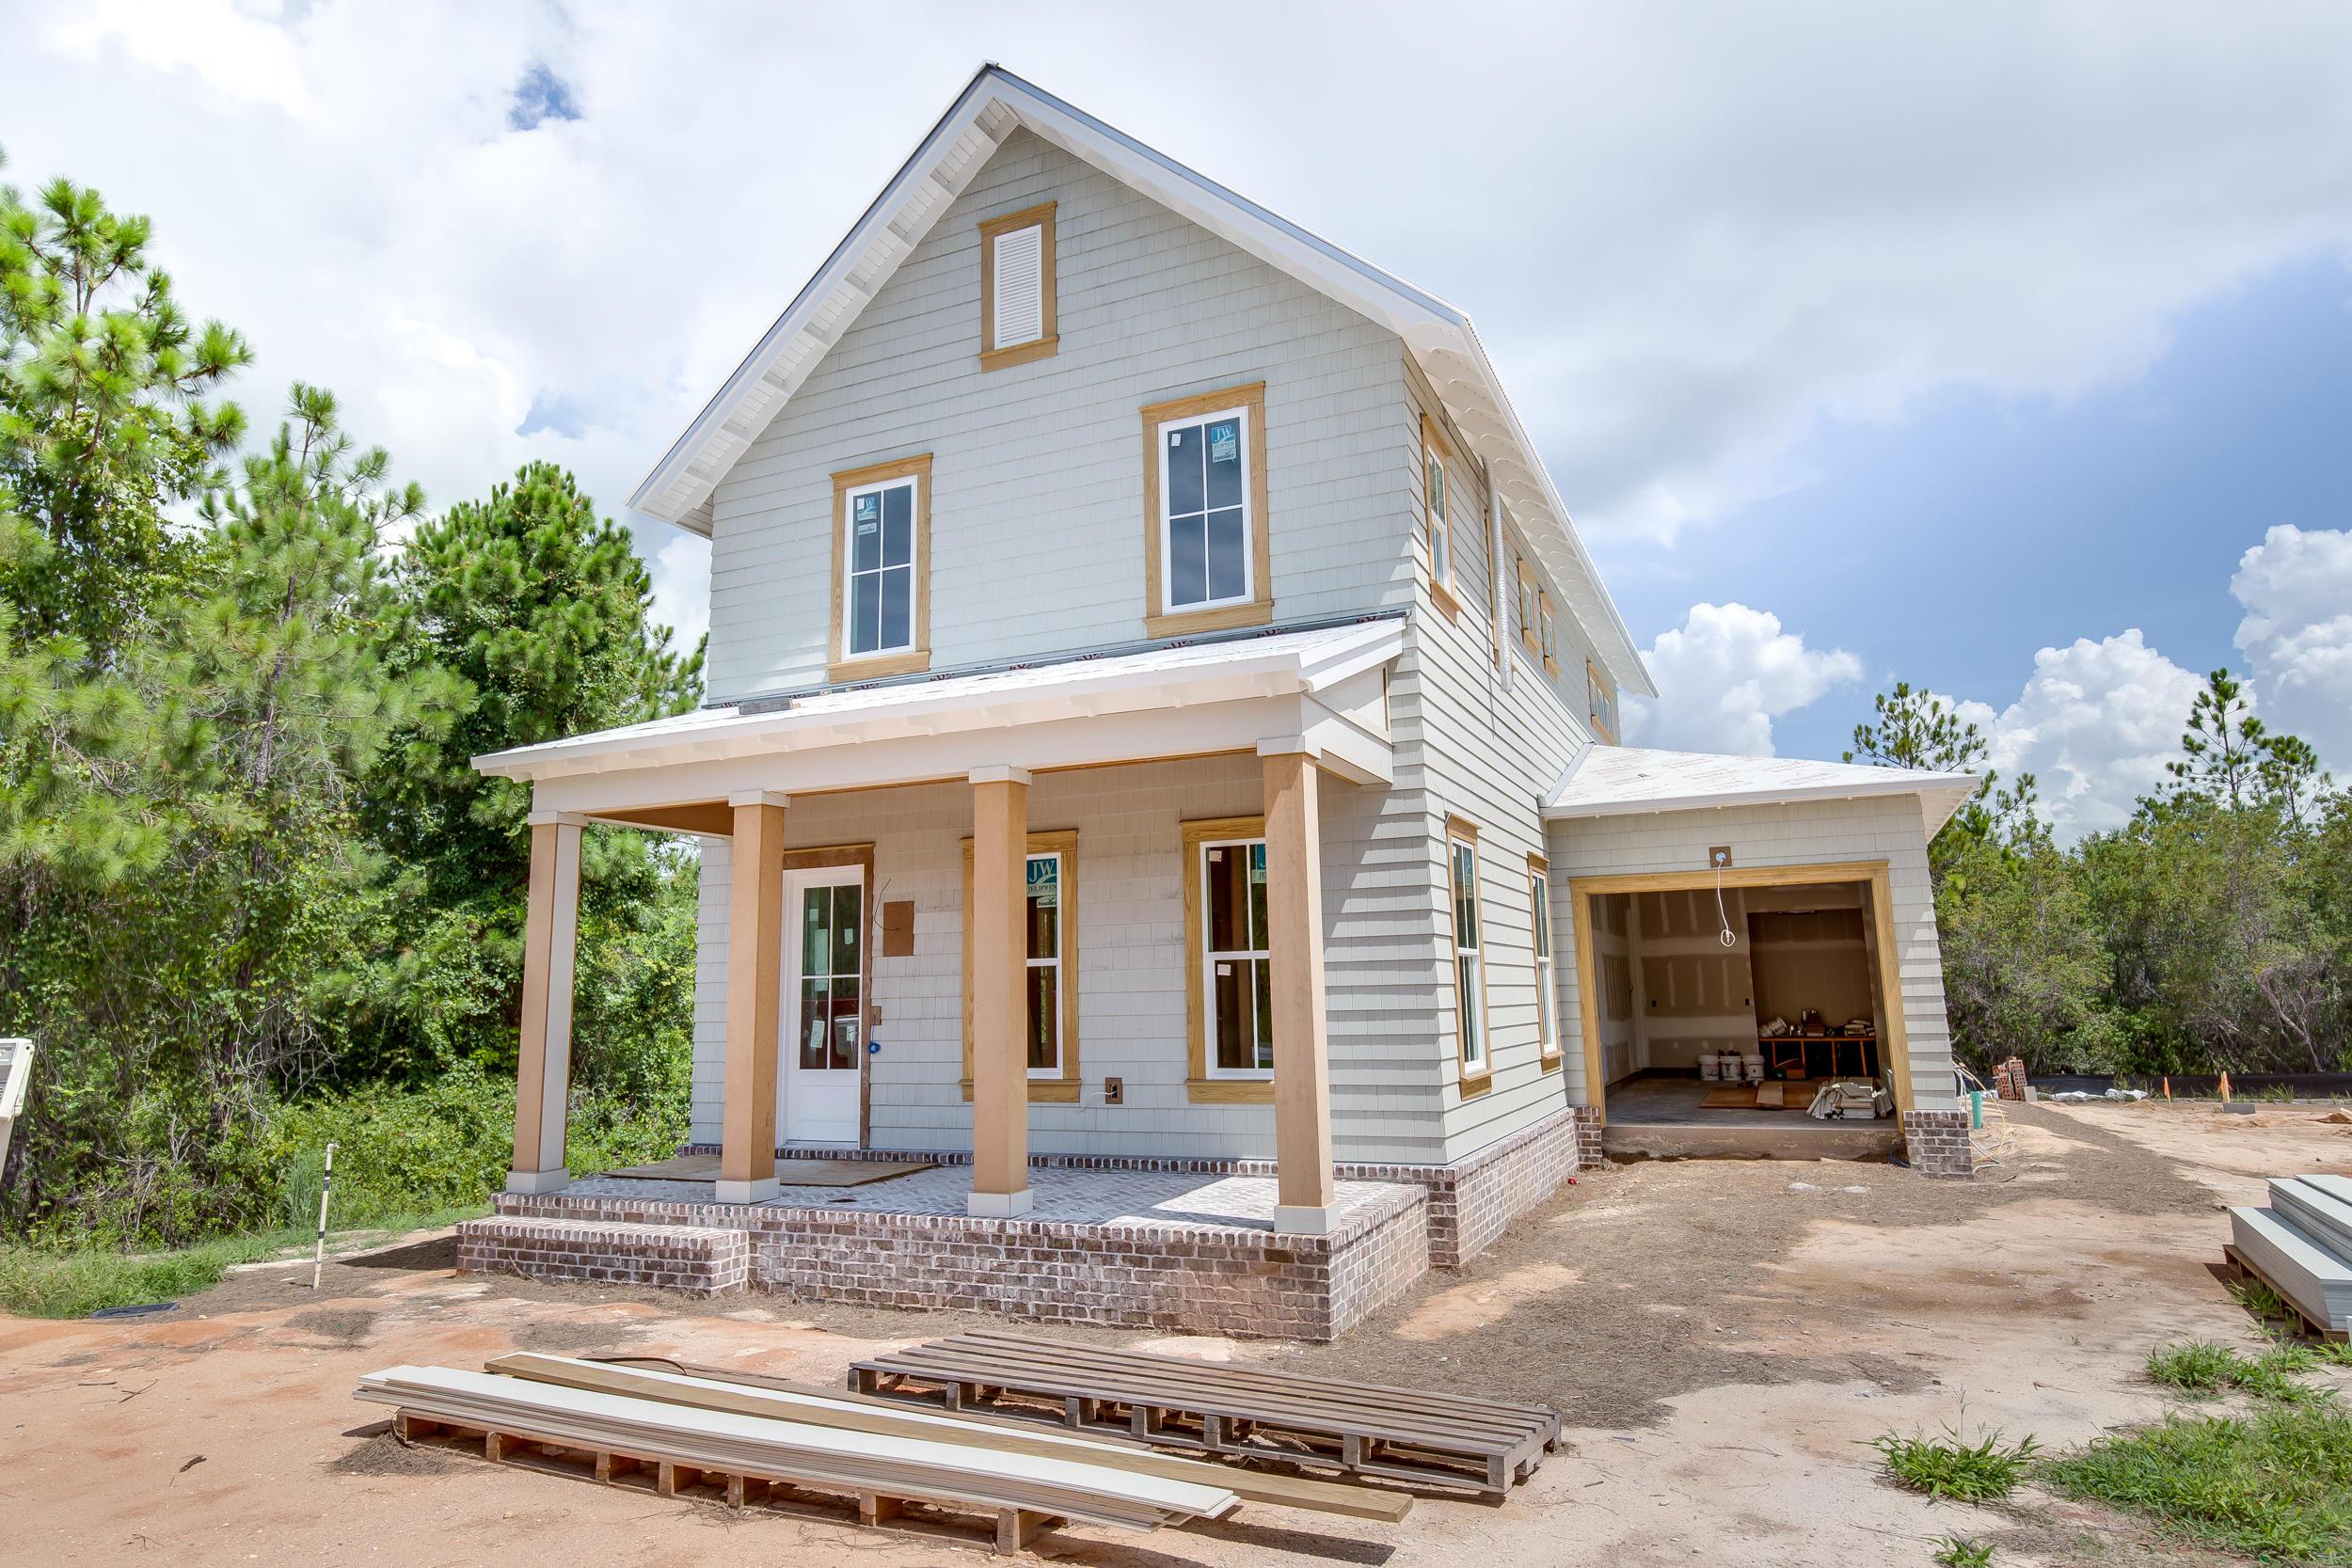 Photo of home for sale at 120 White Cottage, Santa Rosa Beach FL